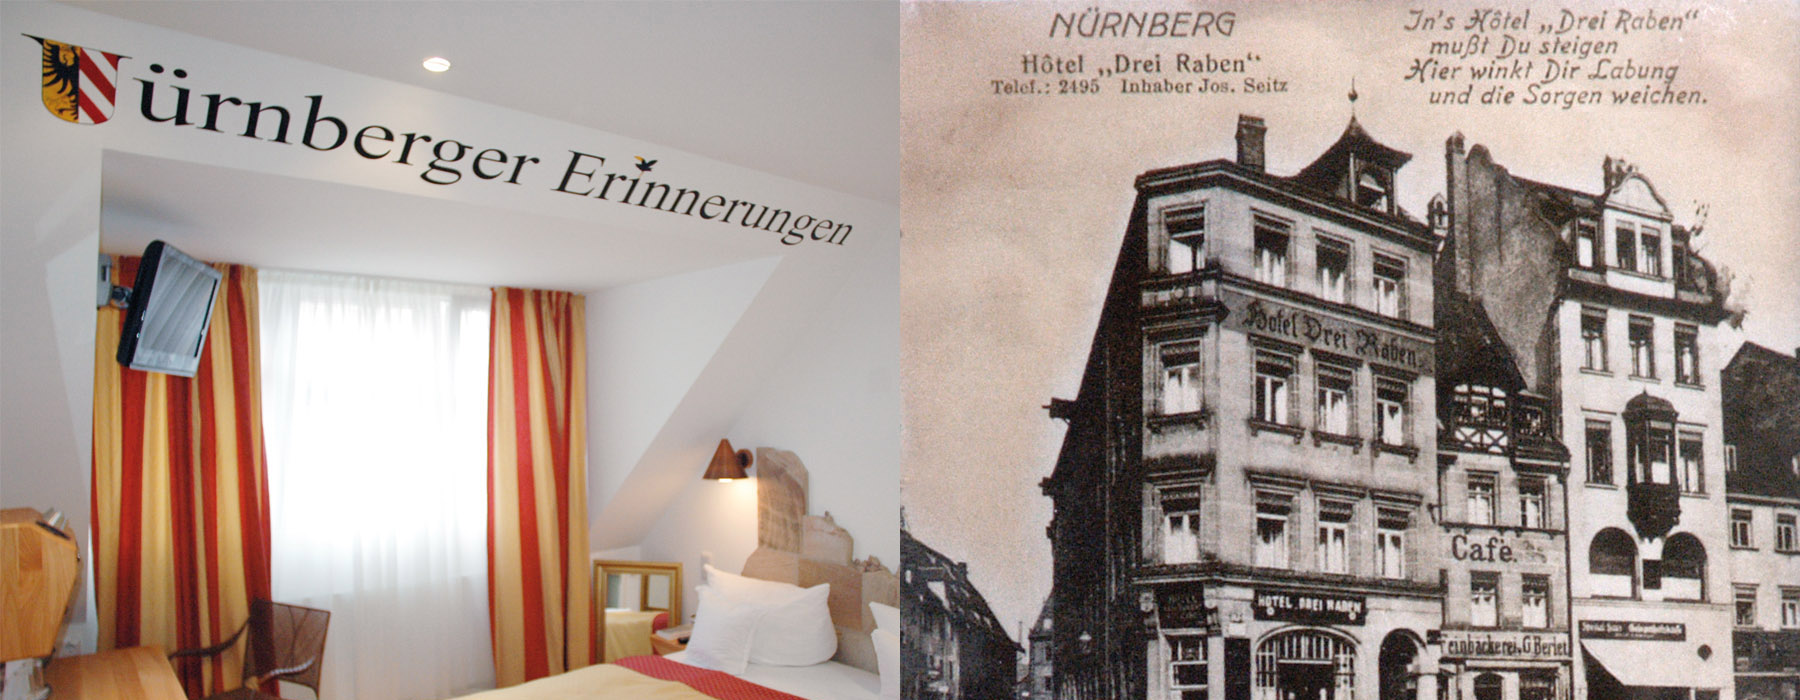 hotel drei raben n rnberg rooms nuremberg memories. Black Bedroom Furniture Sets. Home Design Ideas